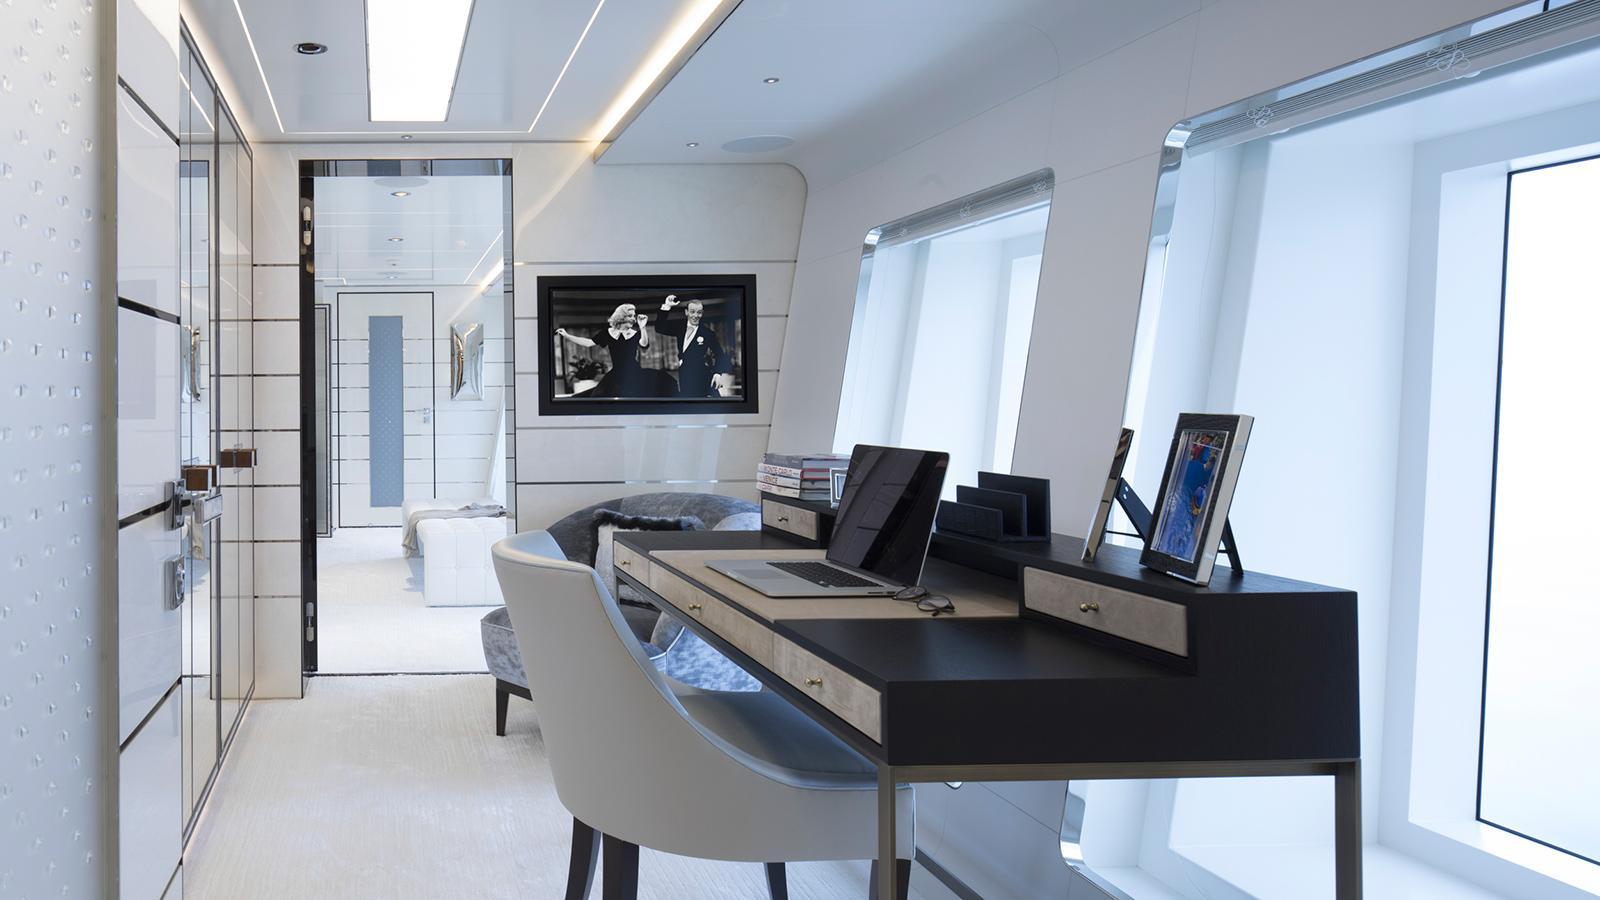 roe razan motoryacht turquoise yachts 2017 47m office